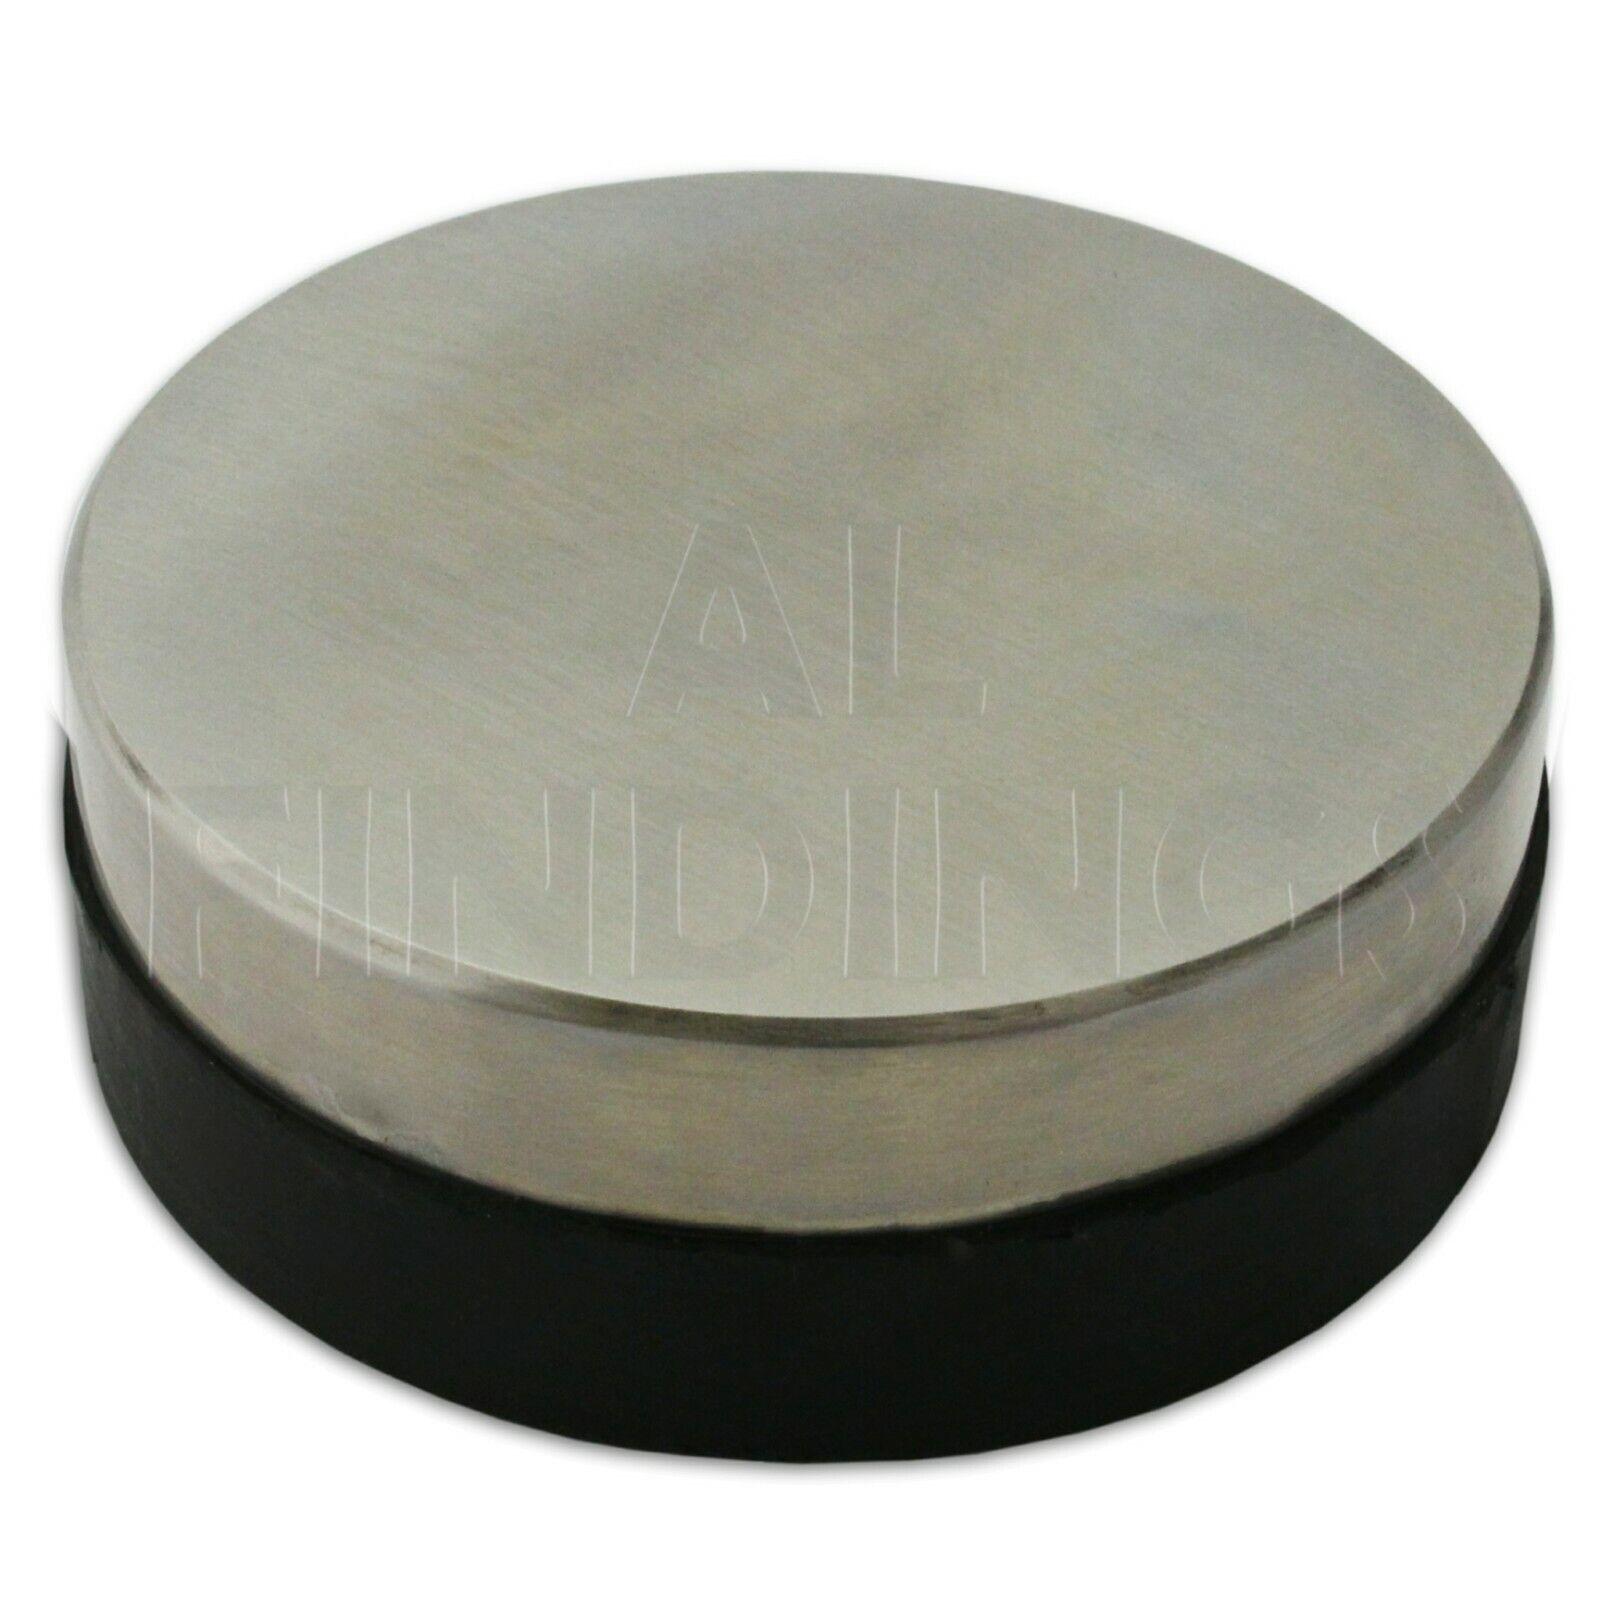 Jewellers Tools Solid Steel Doming Bench Block Anvil 2 X 2 X 3//4 50 x 50 x 18mm Craft Tool